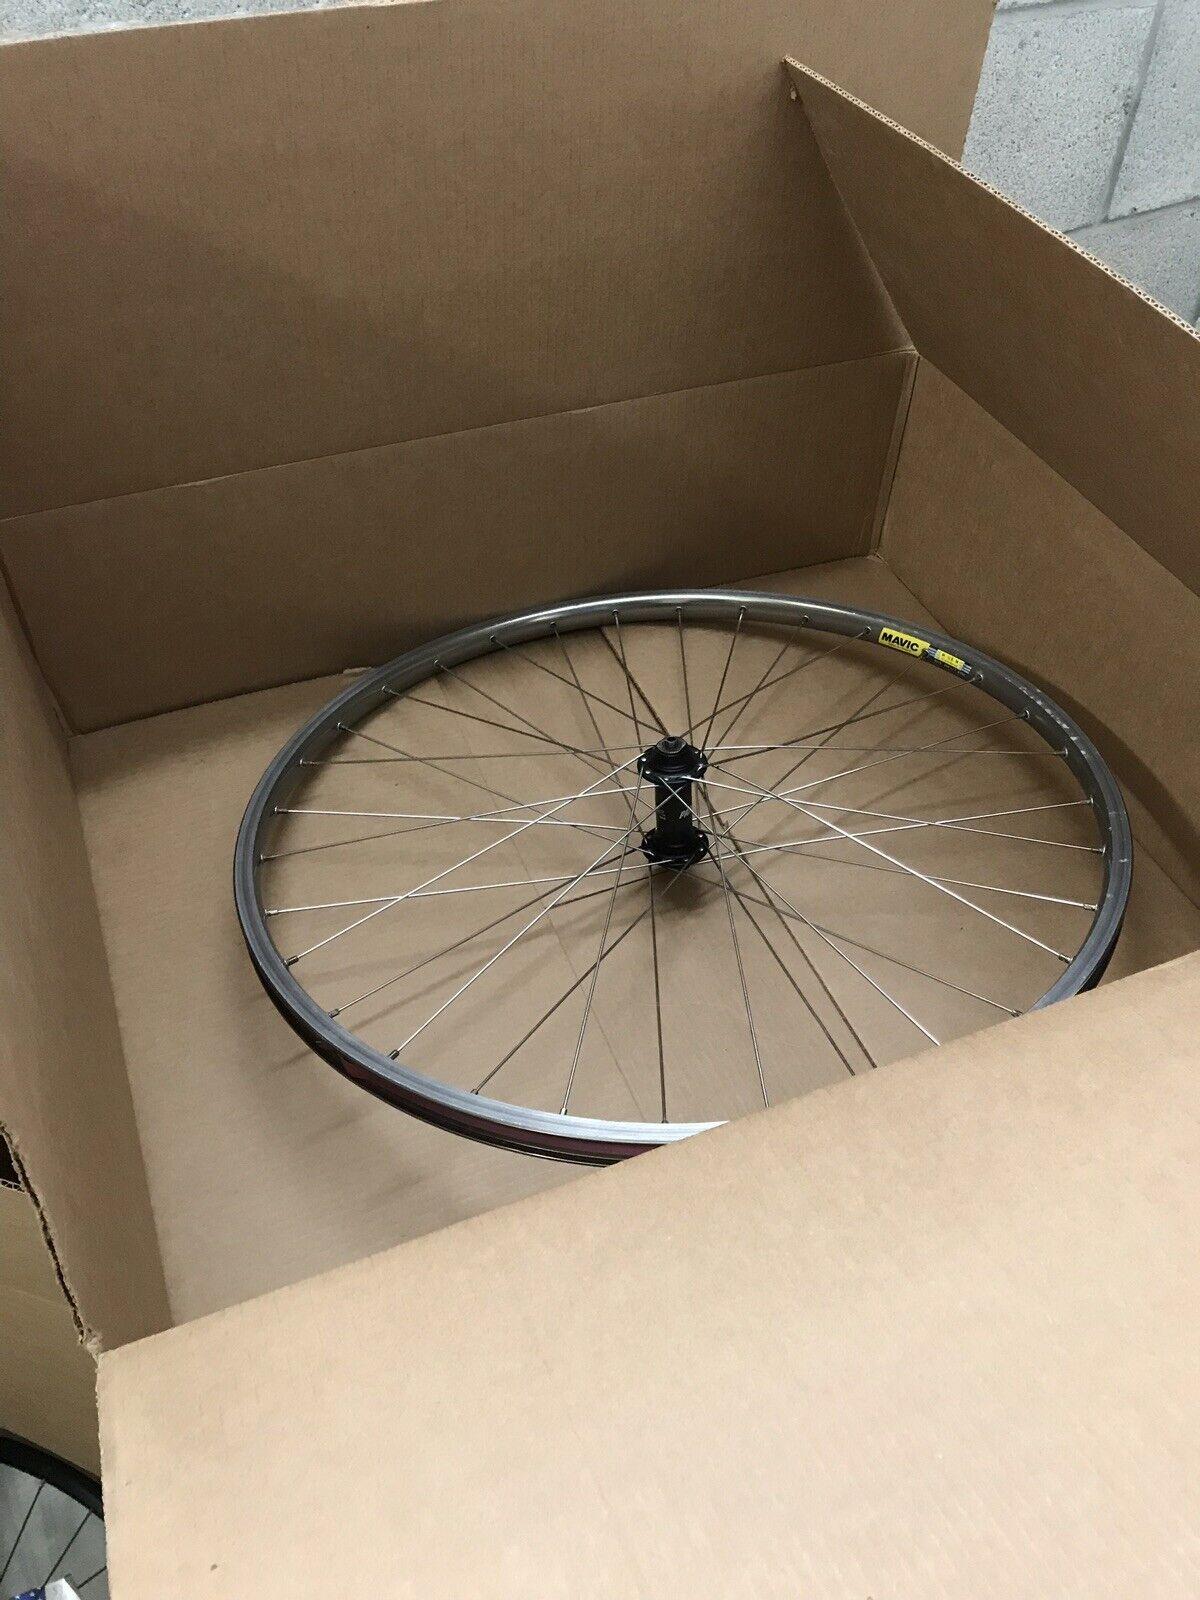 MAVIC rear  559x17 237s  Wheel  bicycle w  Shimano Deore x7 hb-m563 parallax hub